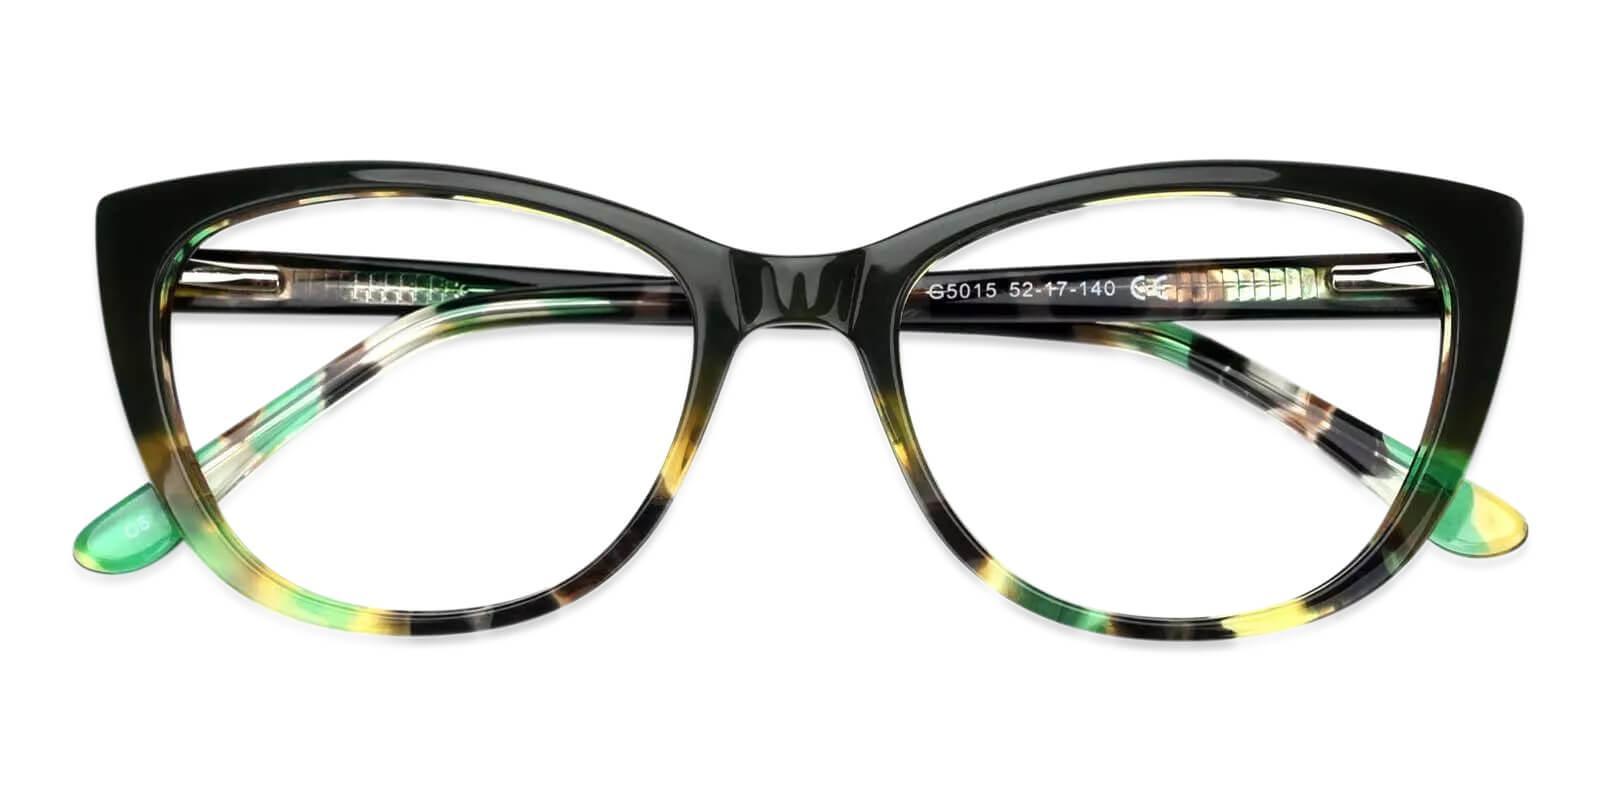 Freda Green Acetate Eyeglasses , Fashion , SpringHinges , UniversalBridgeFit Frames from ABBE Glasses